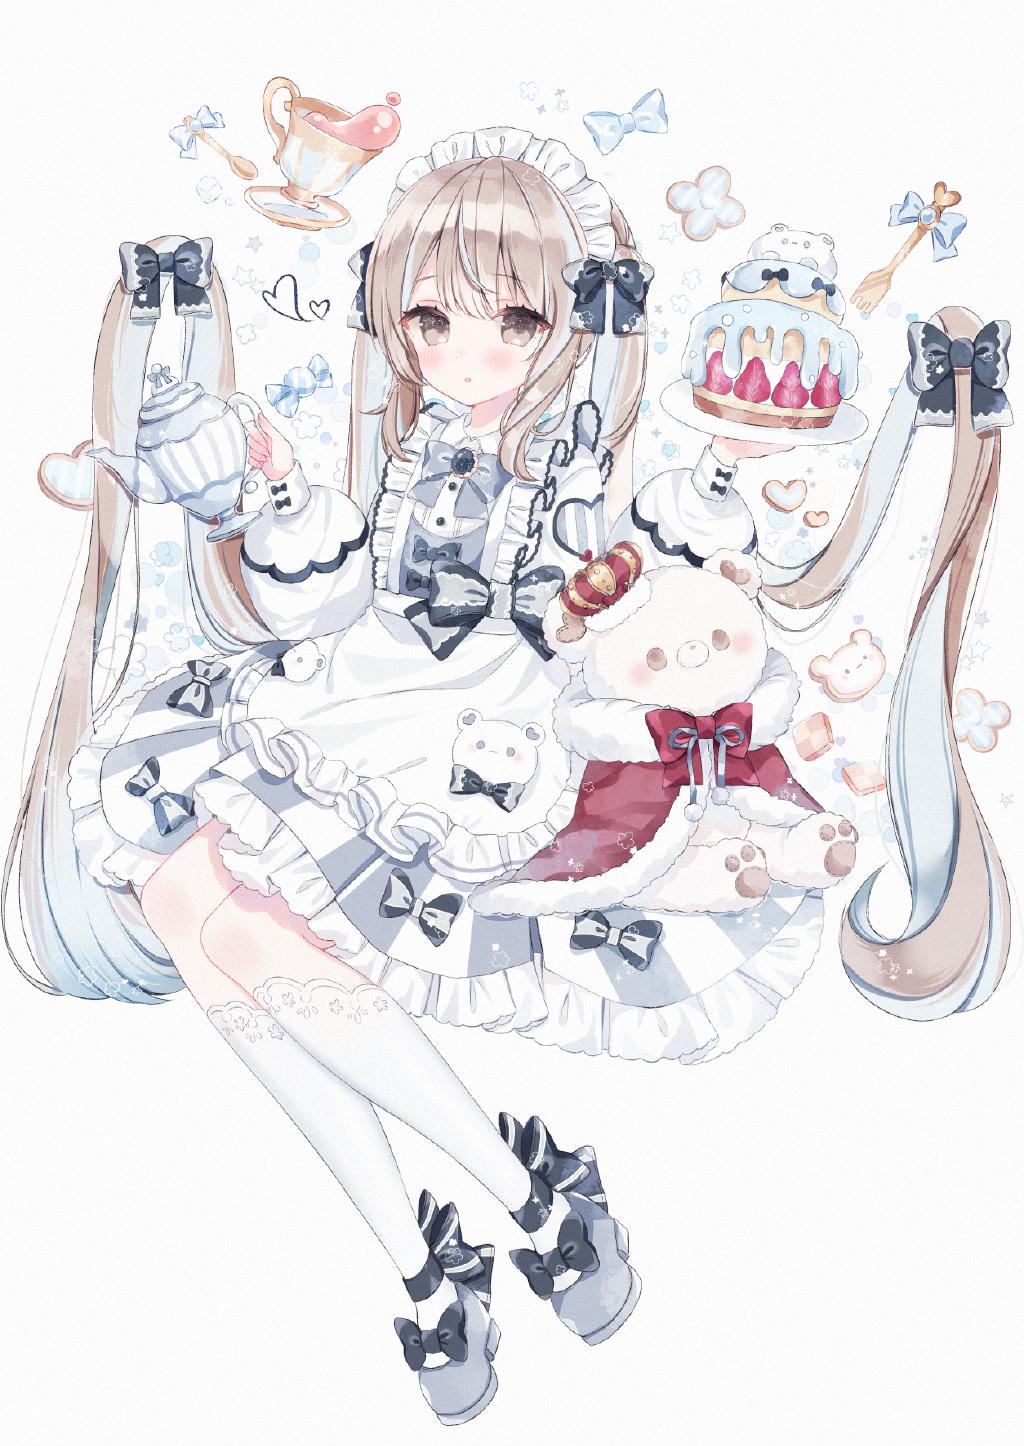 P站精选&萝莉与小裙子!日本画师マコミック的插画作品-Zhaiuu.Com-宅尤尤